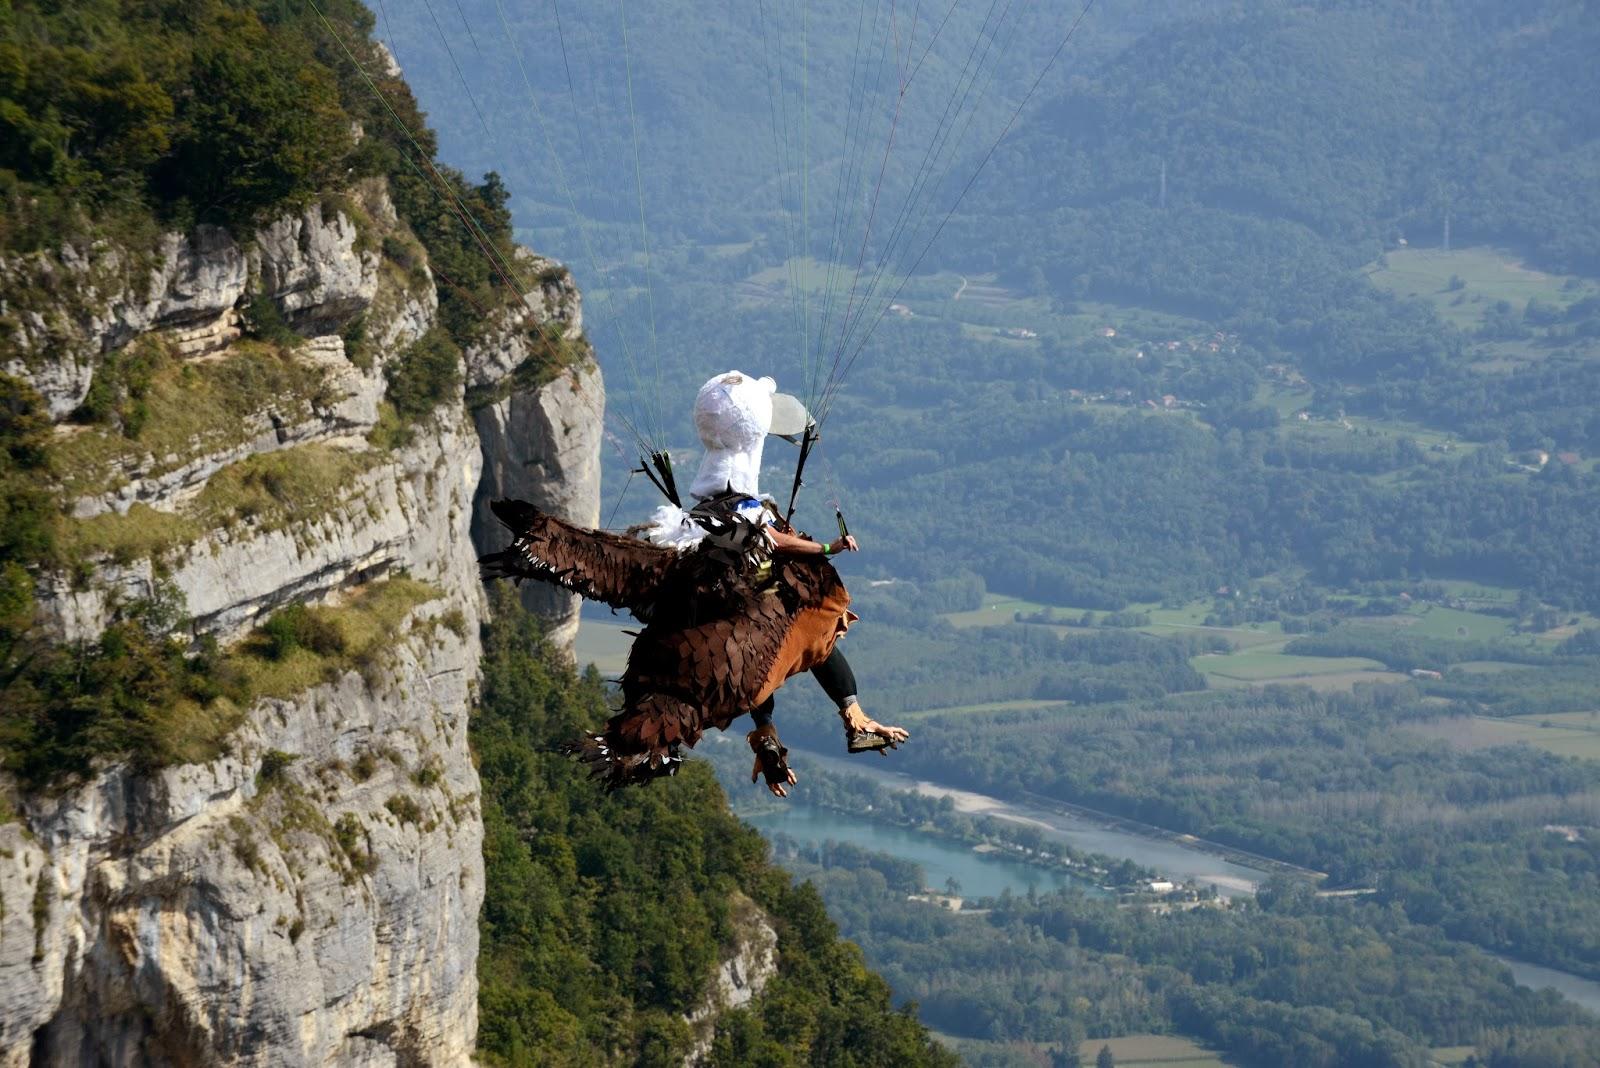 Air balloons, Competition, Contest, Coupe Icare, Festival, France, Icare cup 2013, Icare Festival, Icarus Cup, Masquerade Flight, Offbeat, Para-glider, Saint-Hilaire, Saint-Hilaire-du-Touvet, Tourism, Tourist,